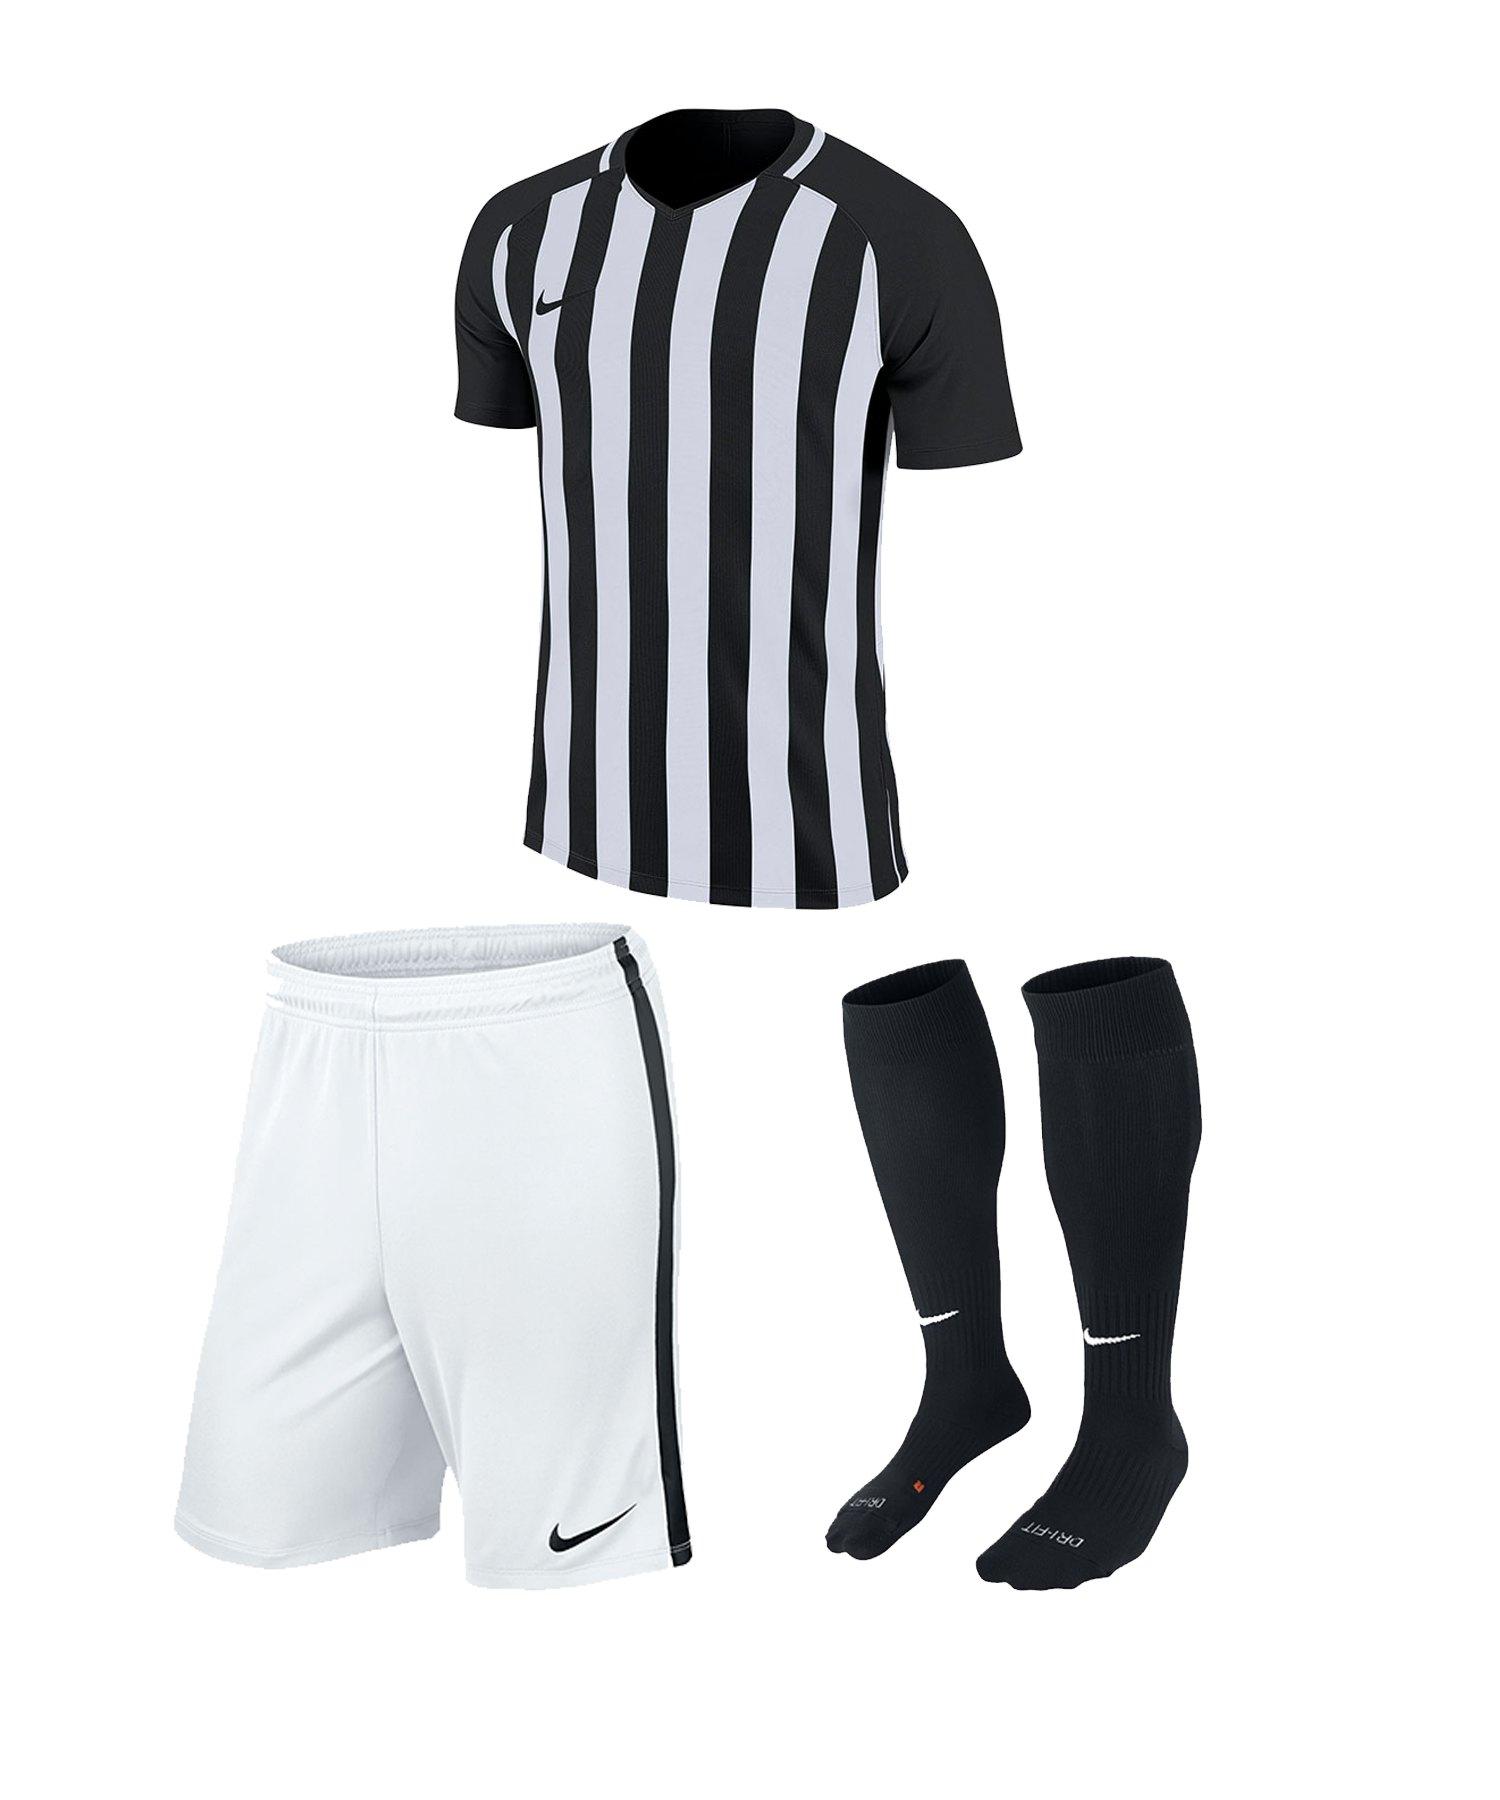 Nike Striped Division III Trikotset kurz Kids F010 - schwarz